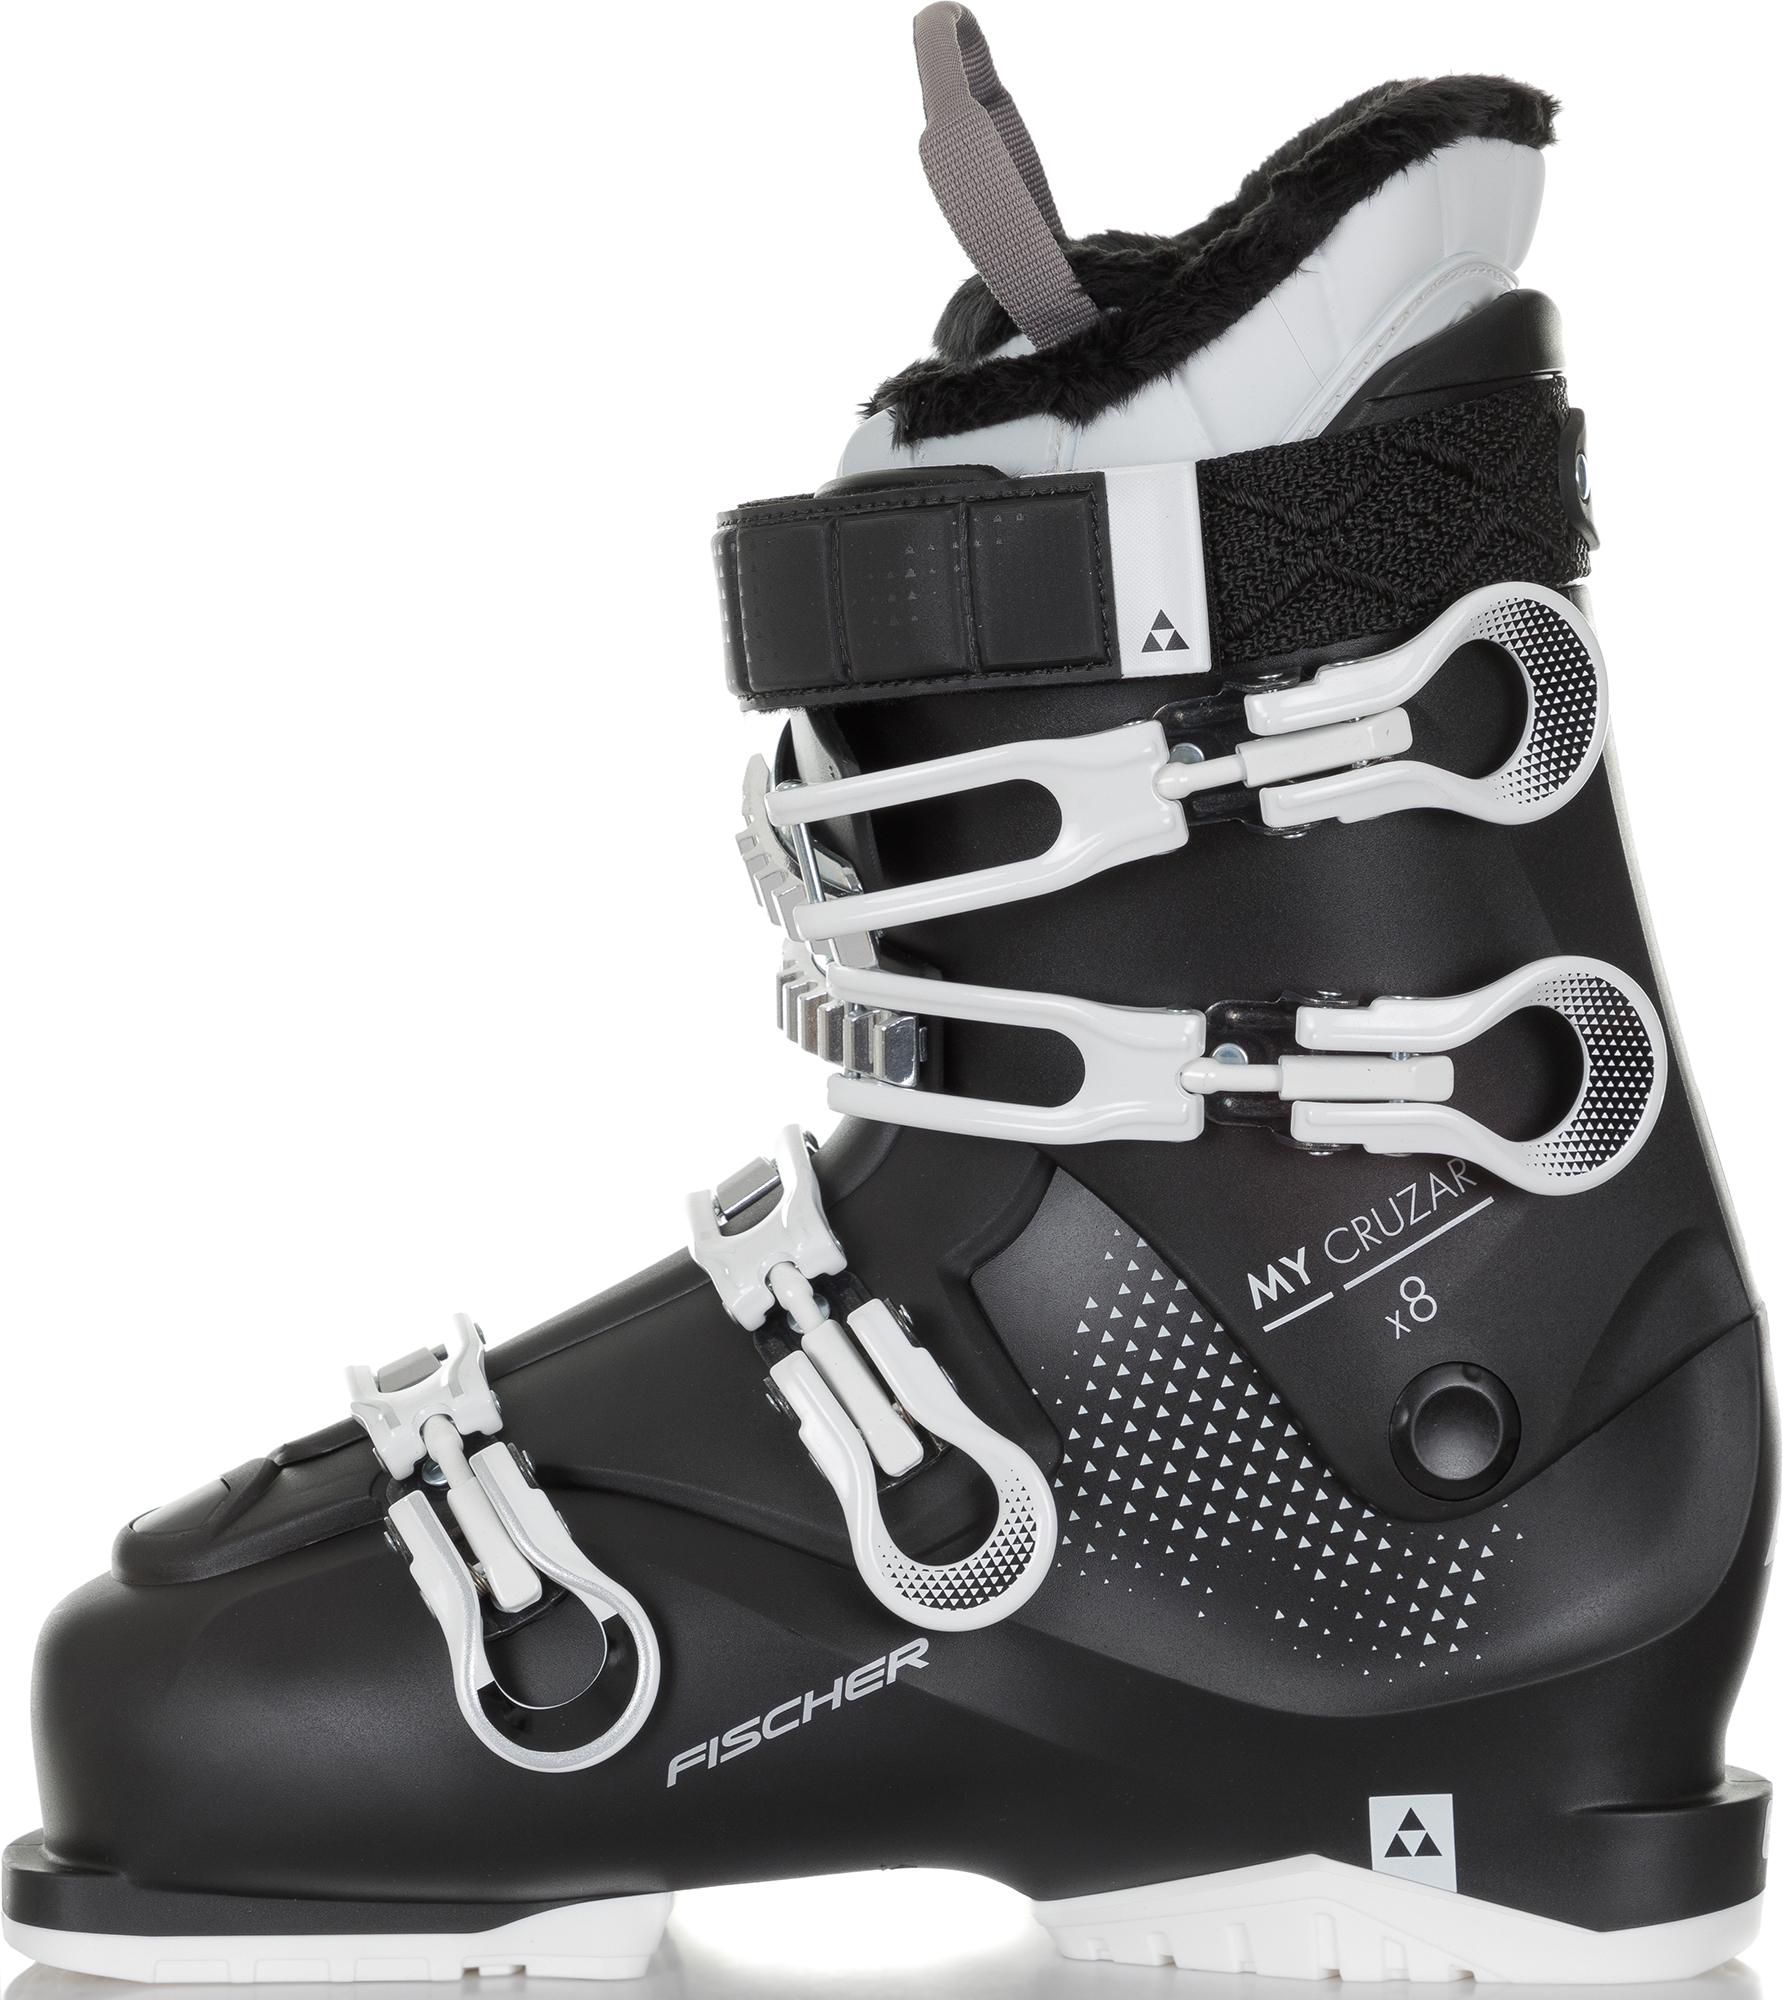 цена на Fischer Ботинки горнолыжные женские Fischer MY CRUZAR X 8,0 THERMOSHAPE, размер 38,5